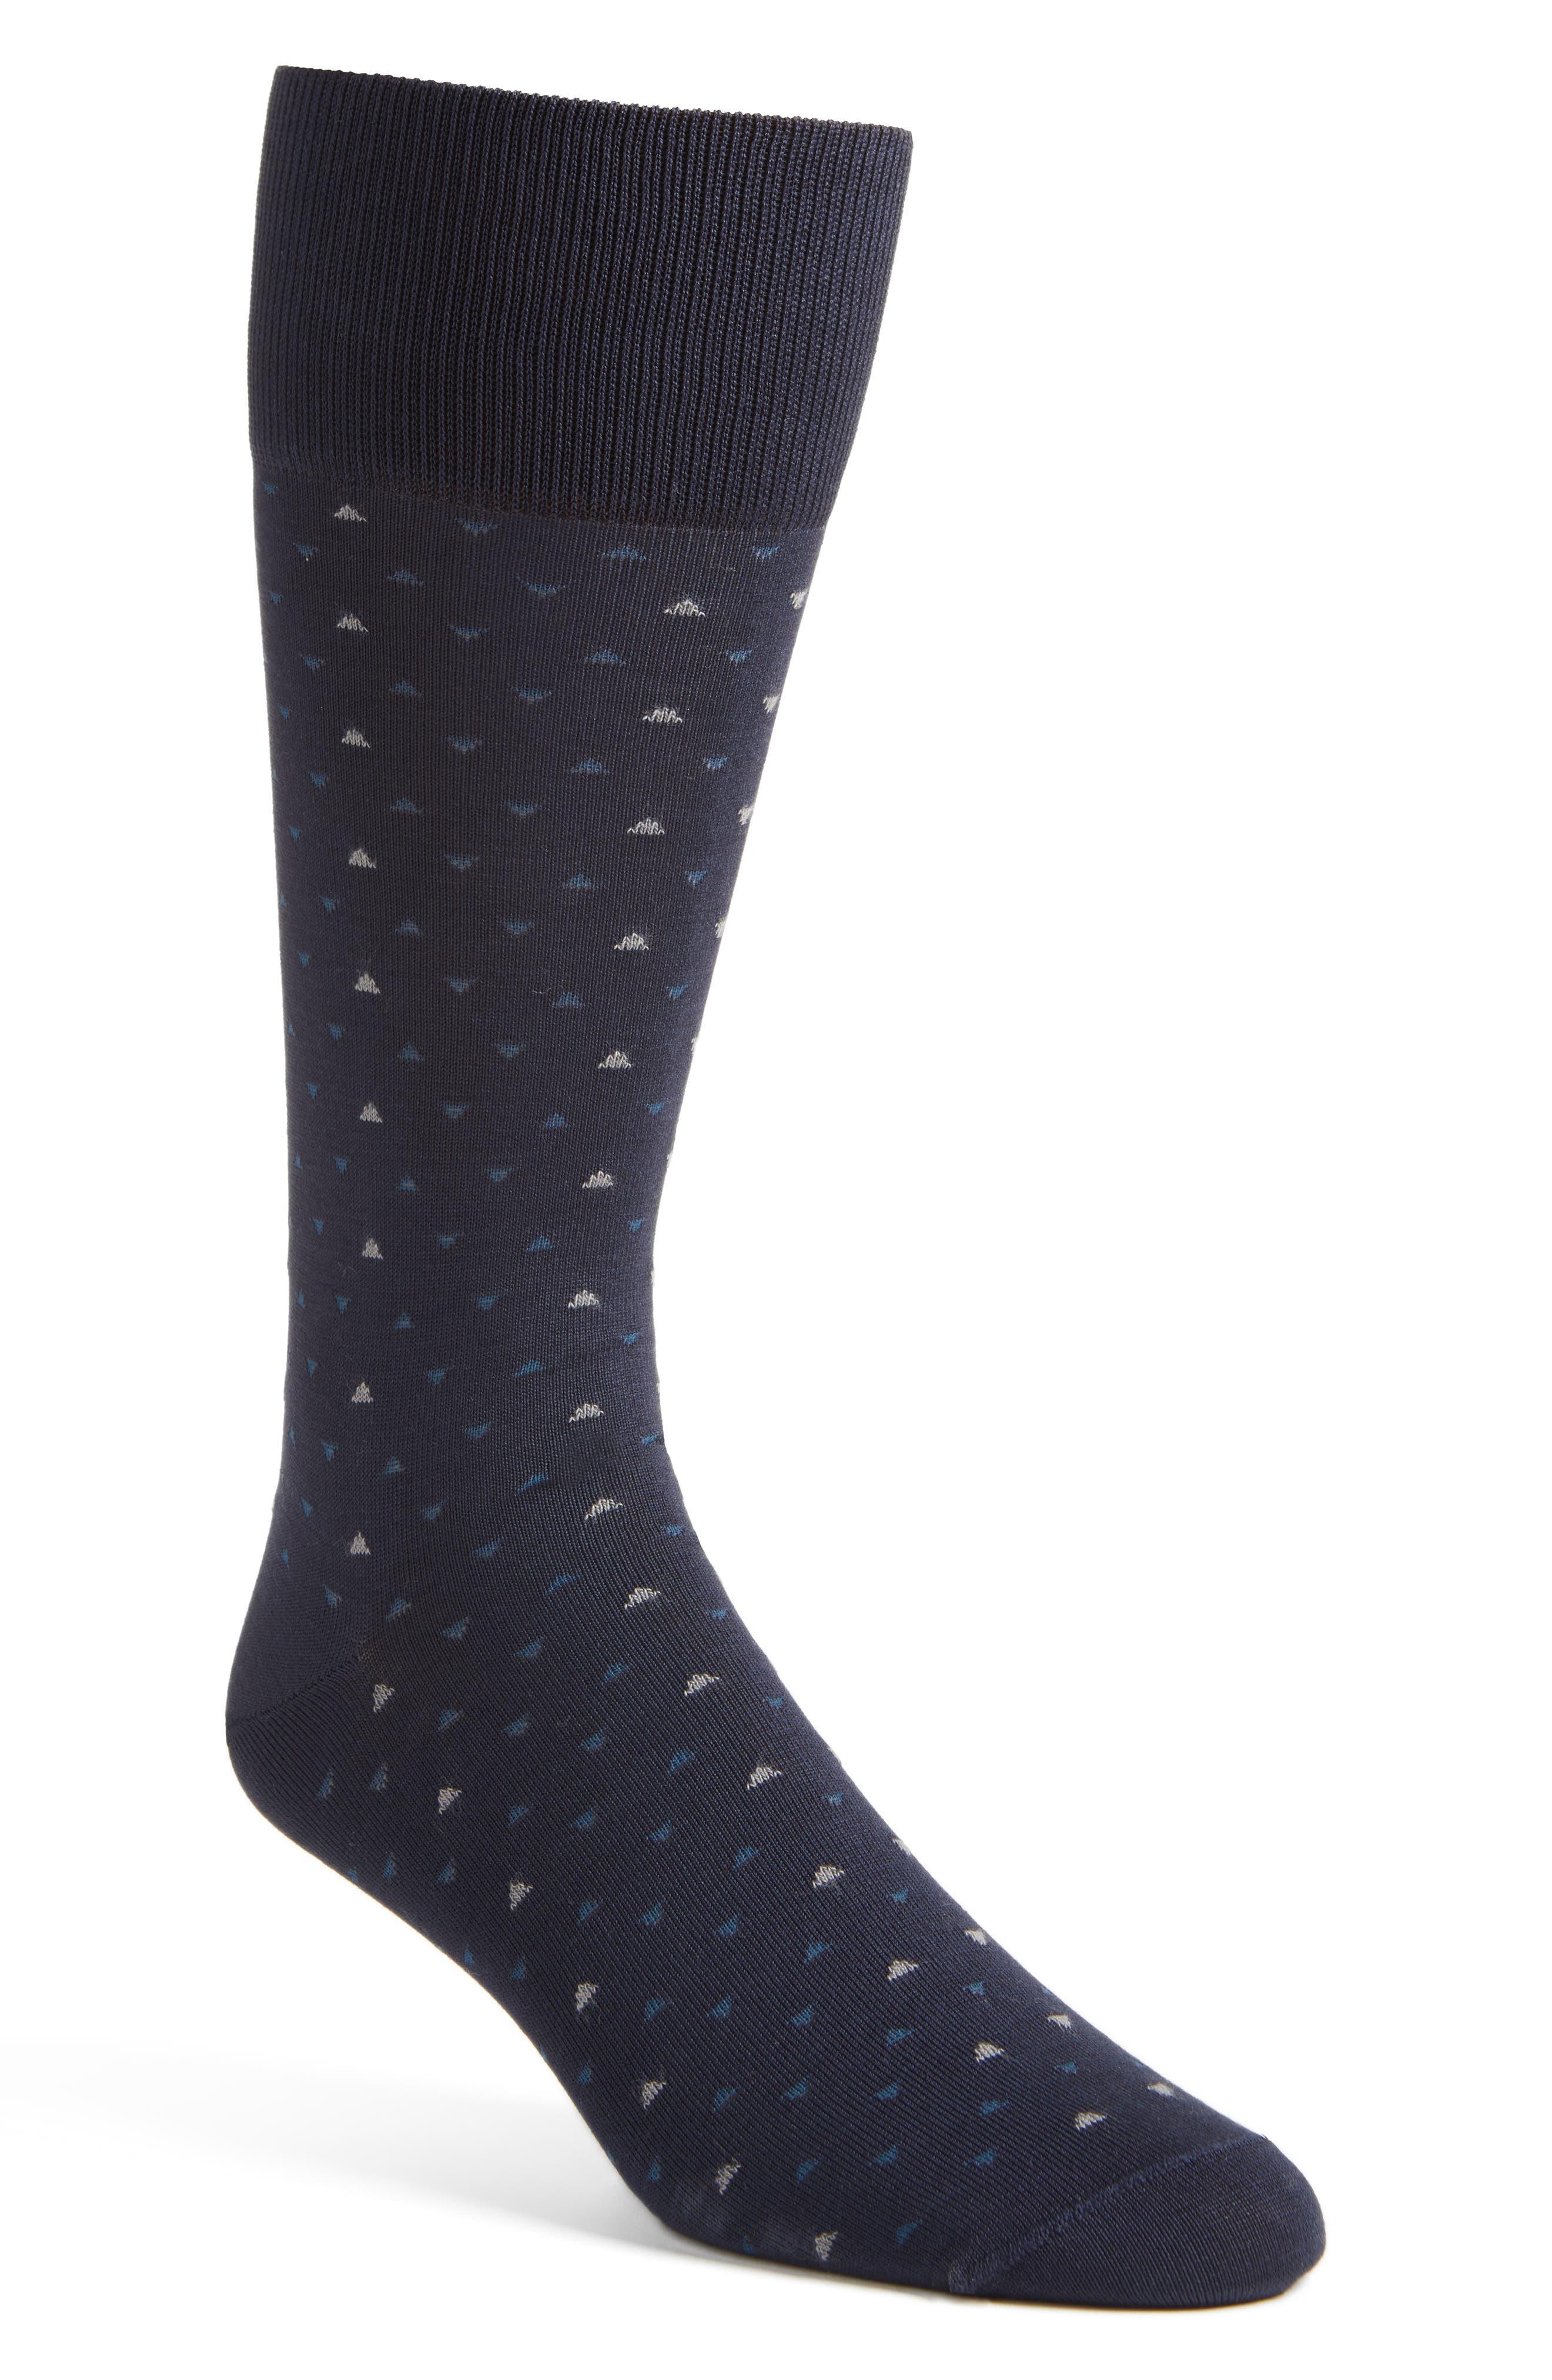 Main Image - John W. Nordstrom® Over the Calf Cascading Triangles Socks